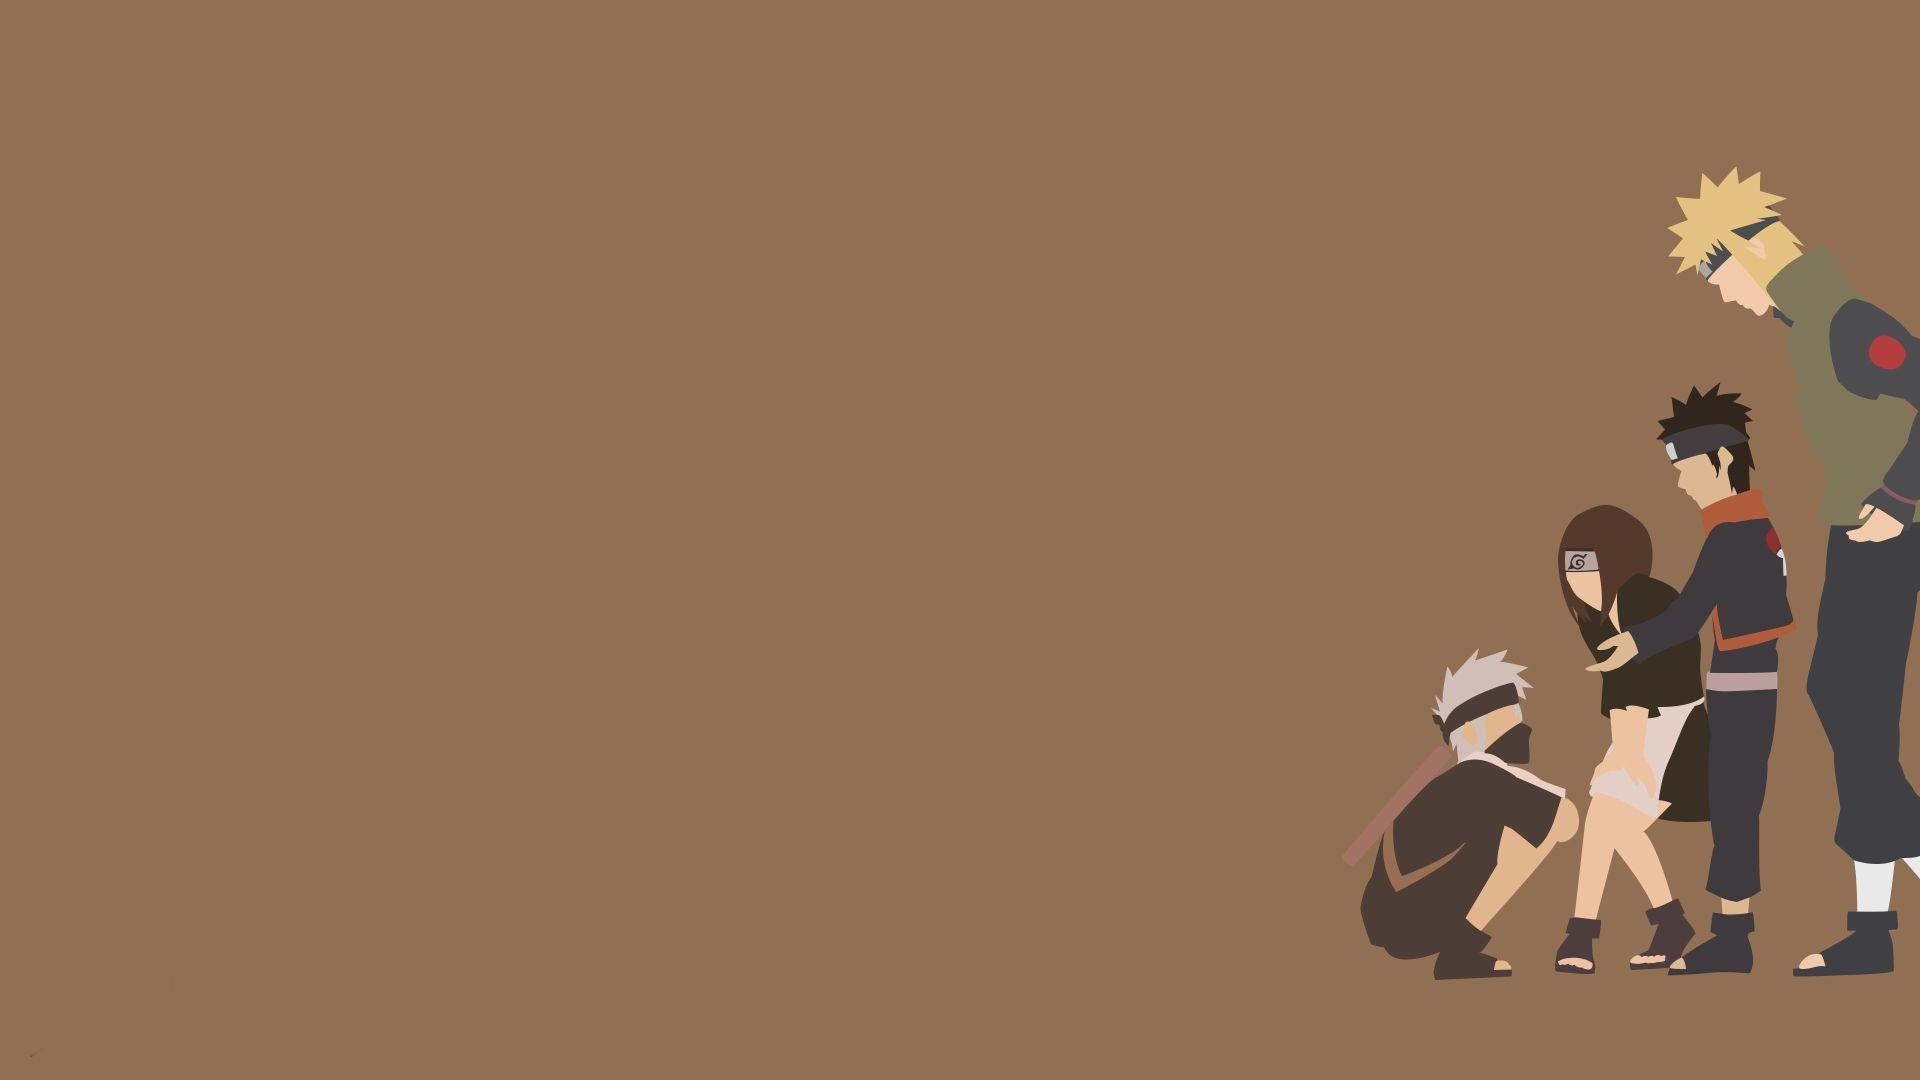 Naruto Minimalist, Wallpaper and Background